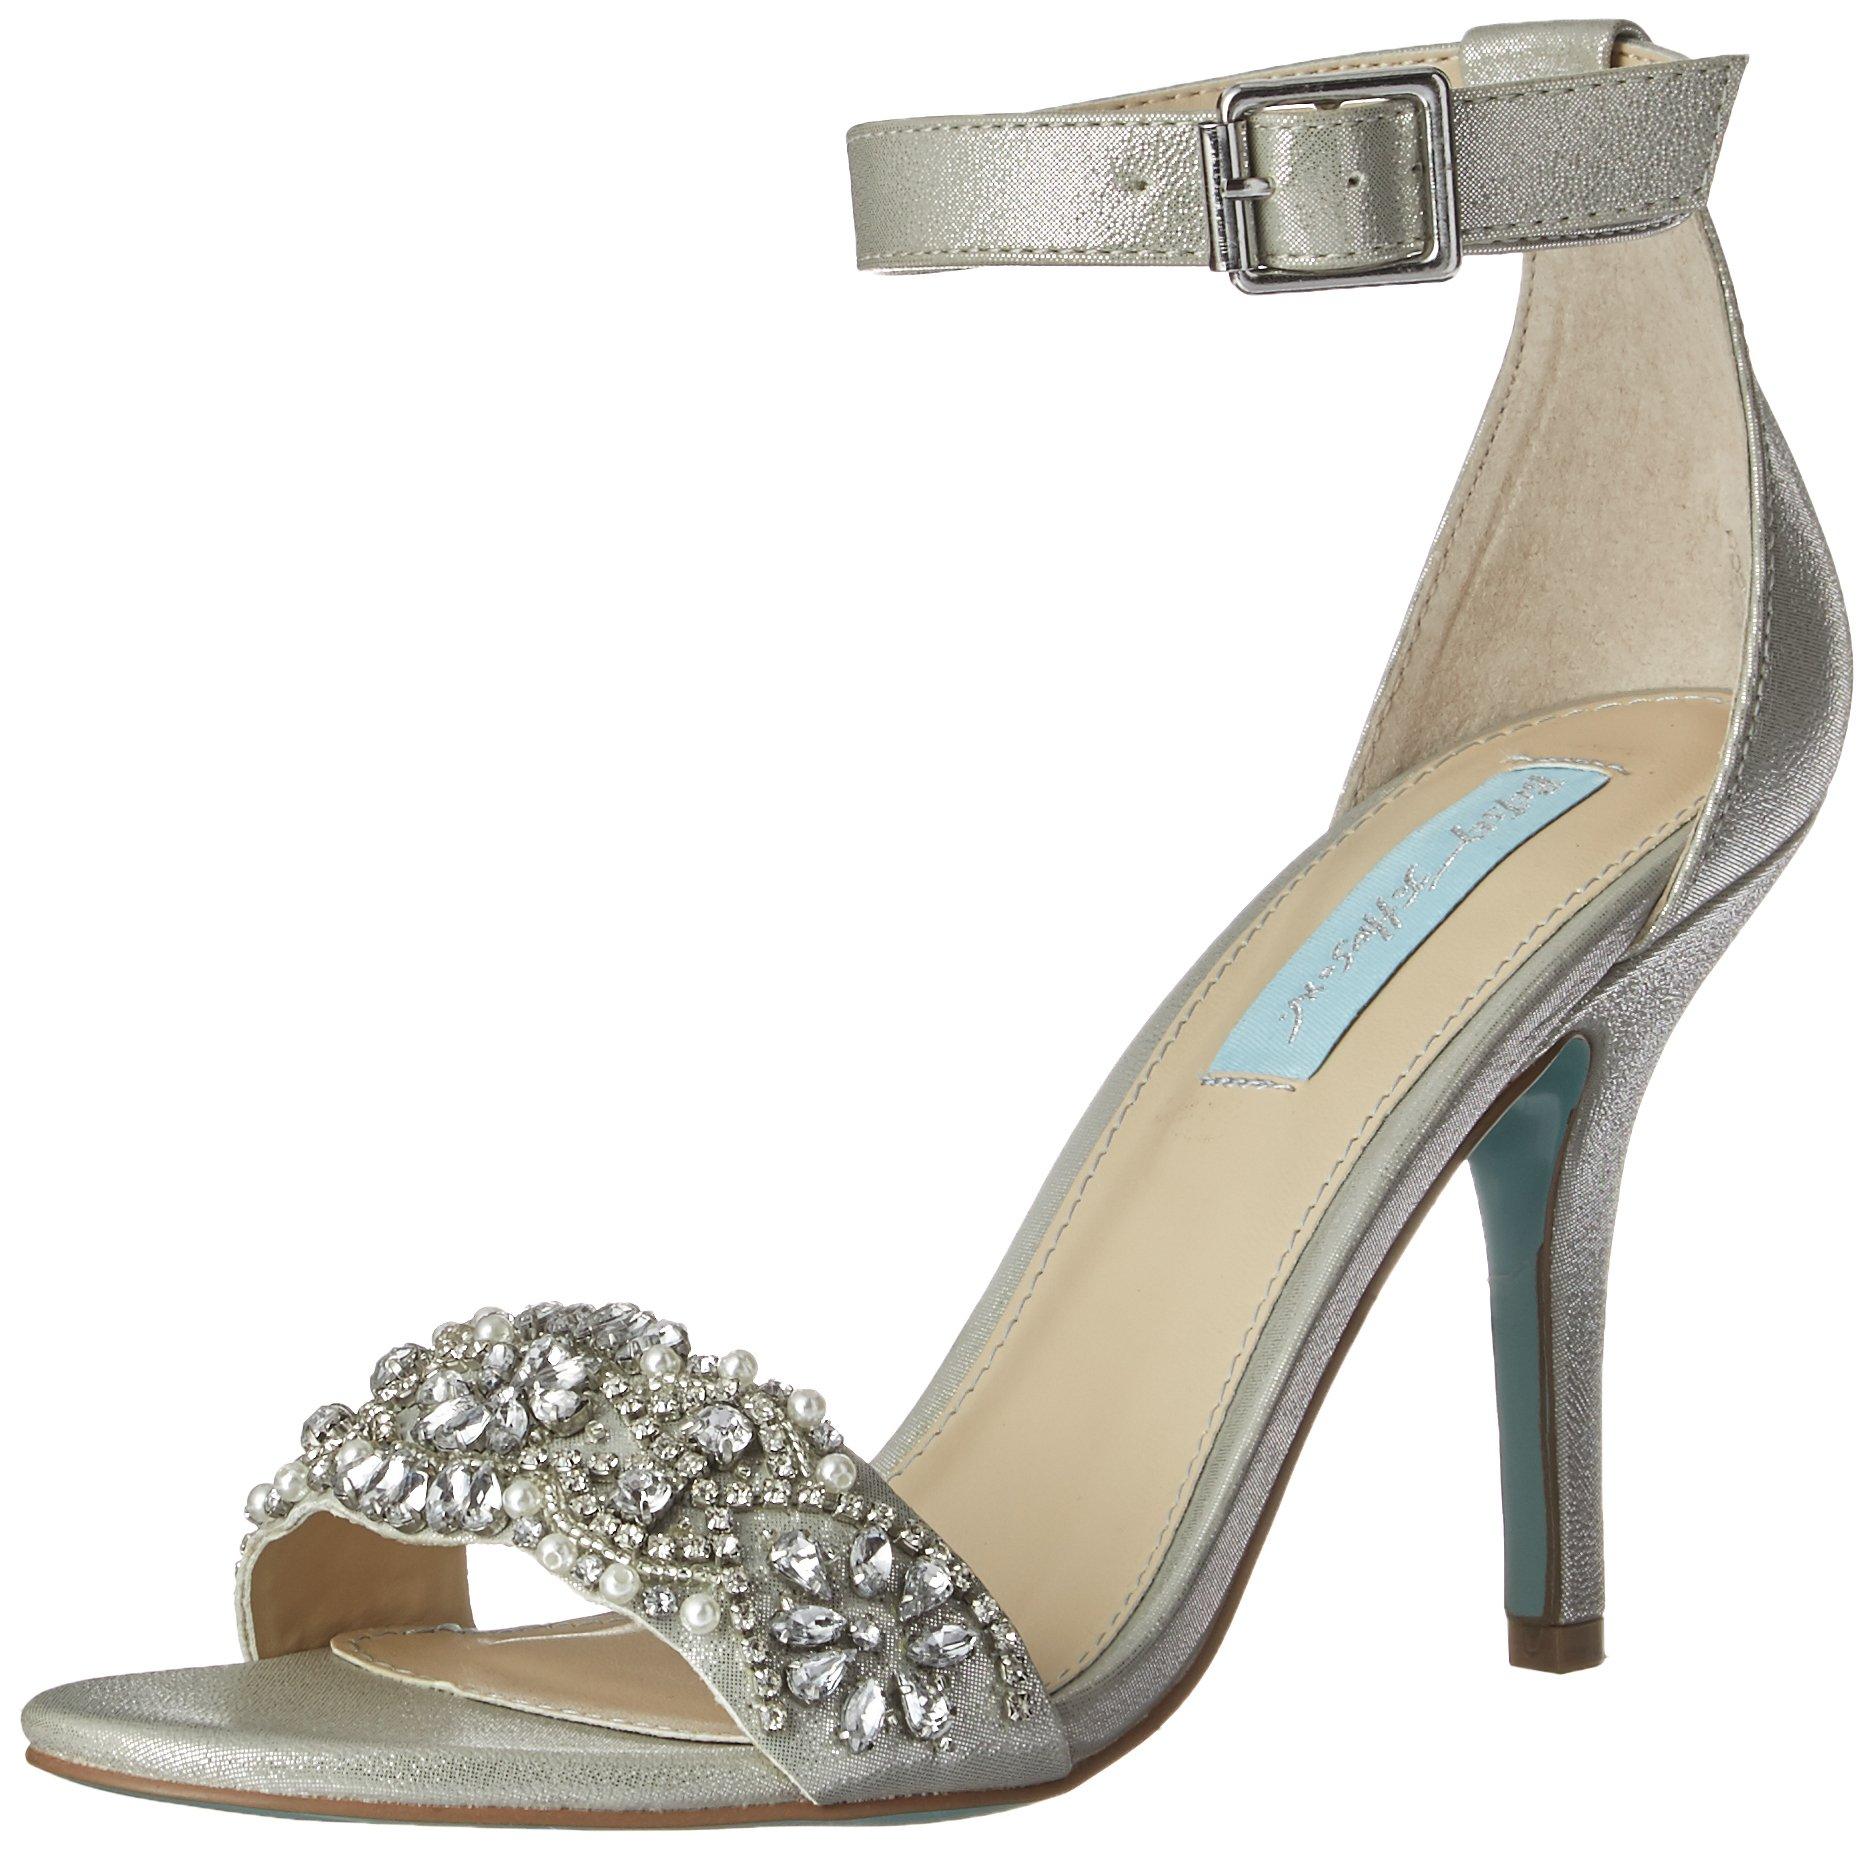 Blue by Betsey Johnson Women's Sb-Gina Dress Sandal, Silver, 8.5 M US